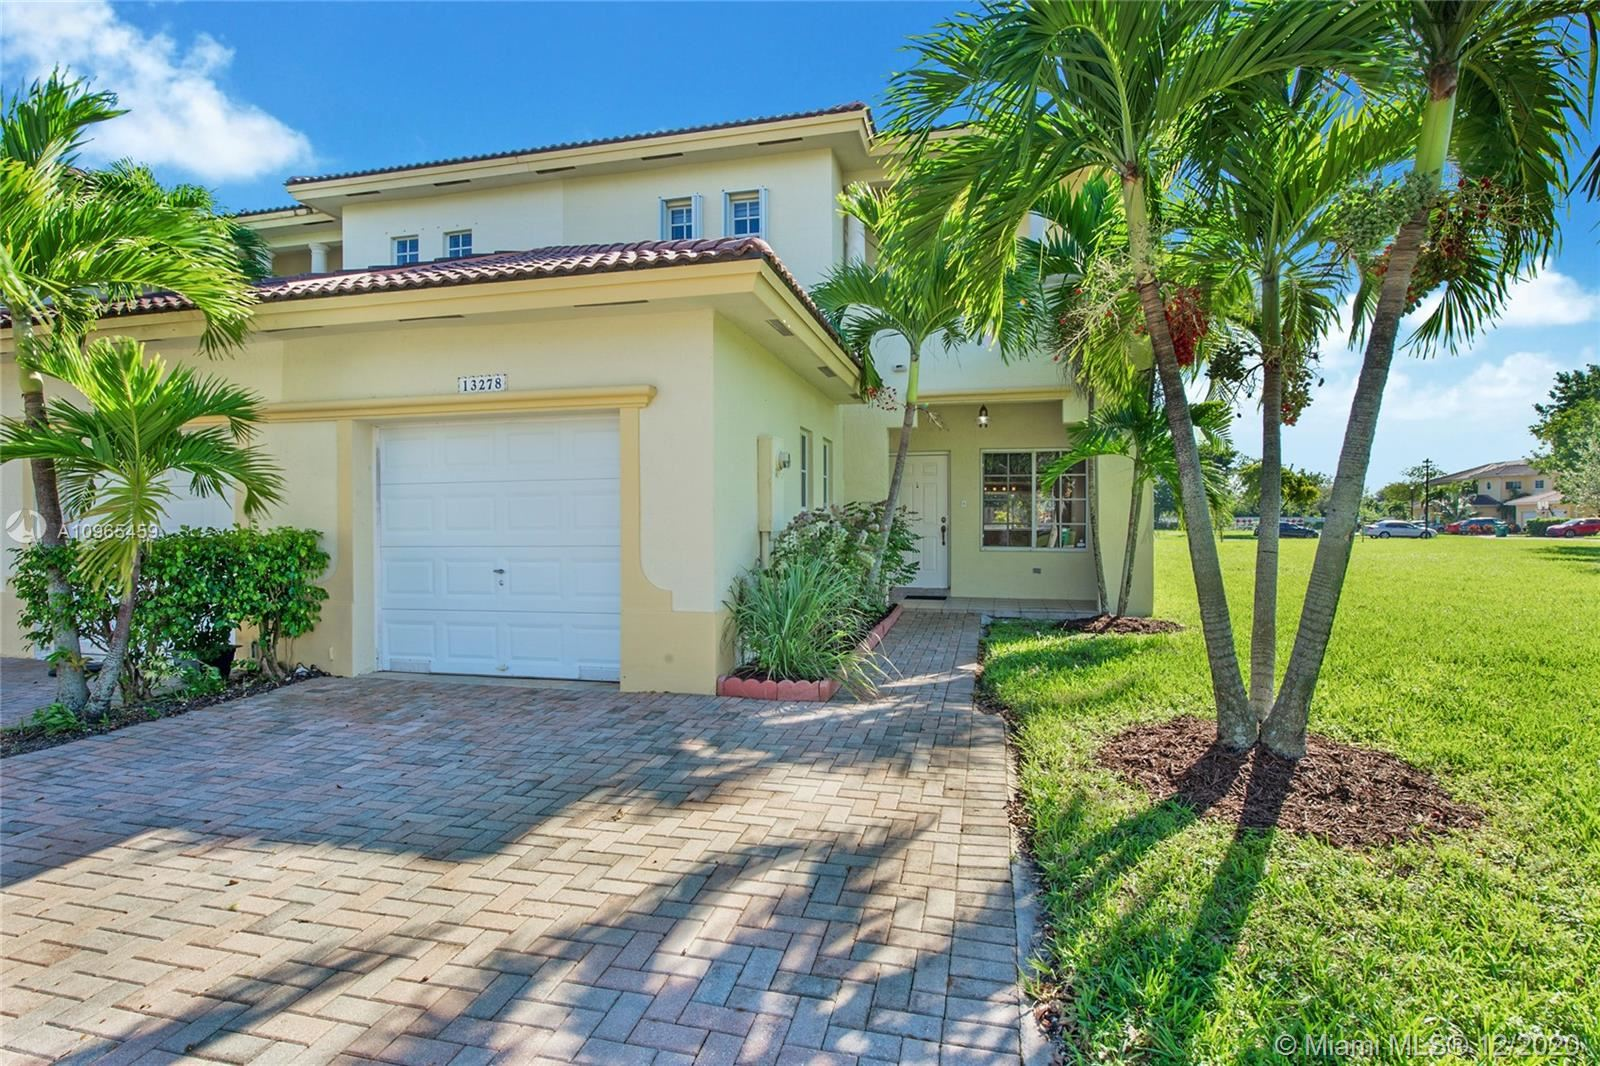 13278 SW 142nd Ter, Miami, FL 33186 - #: A10965459